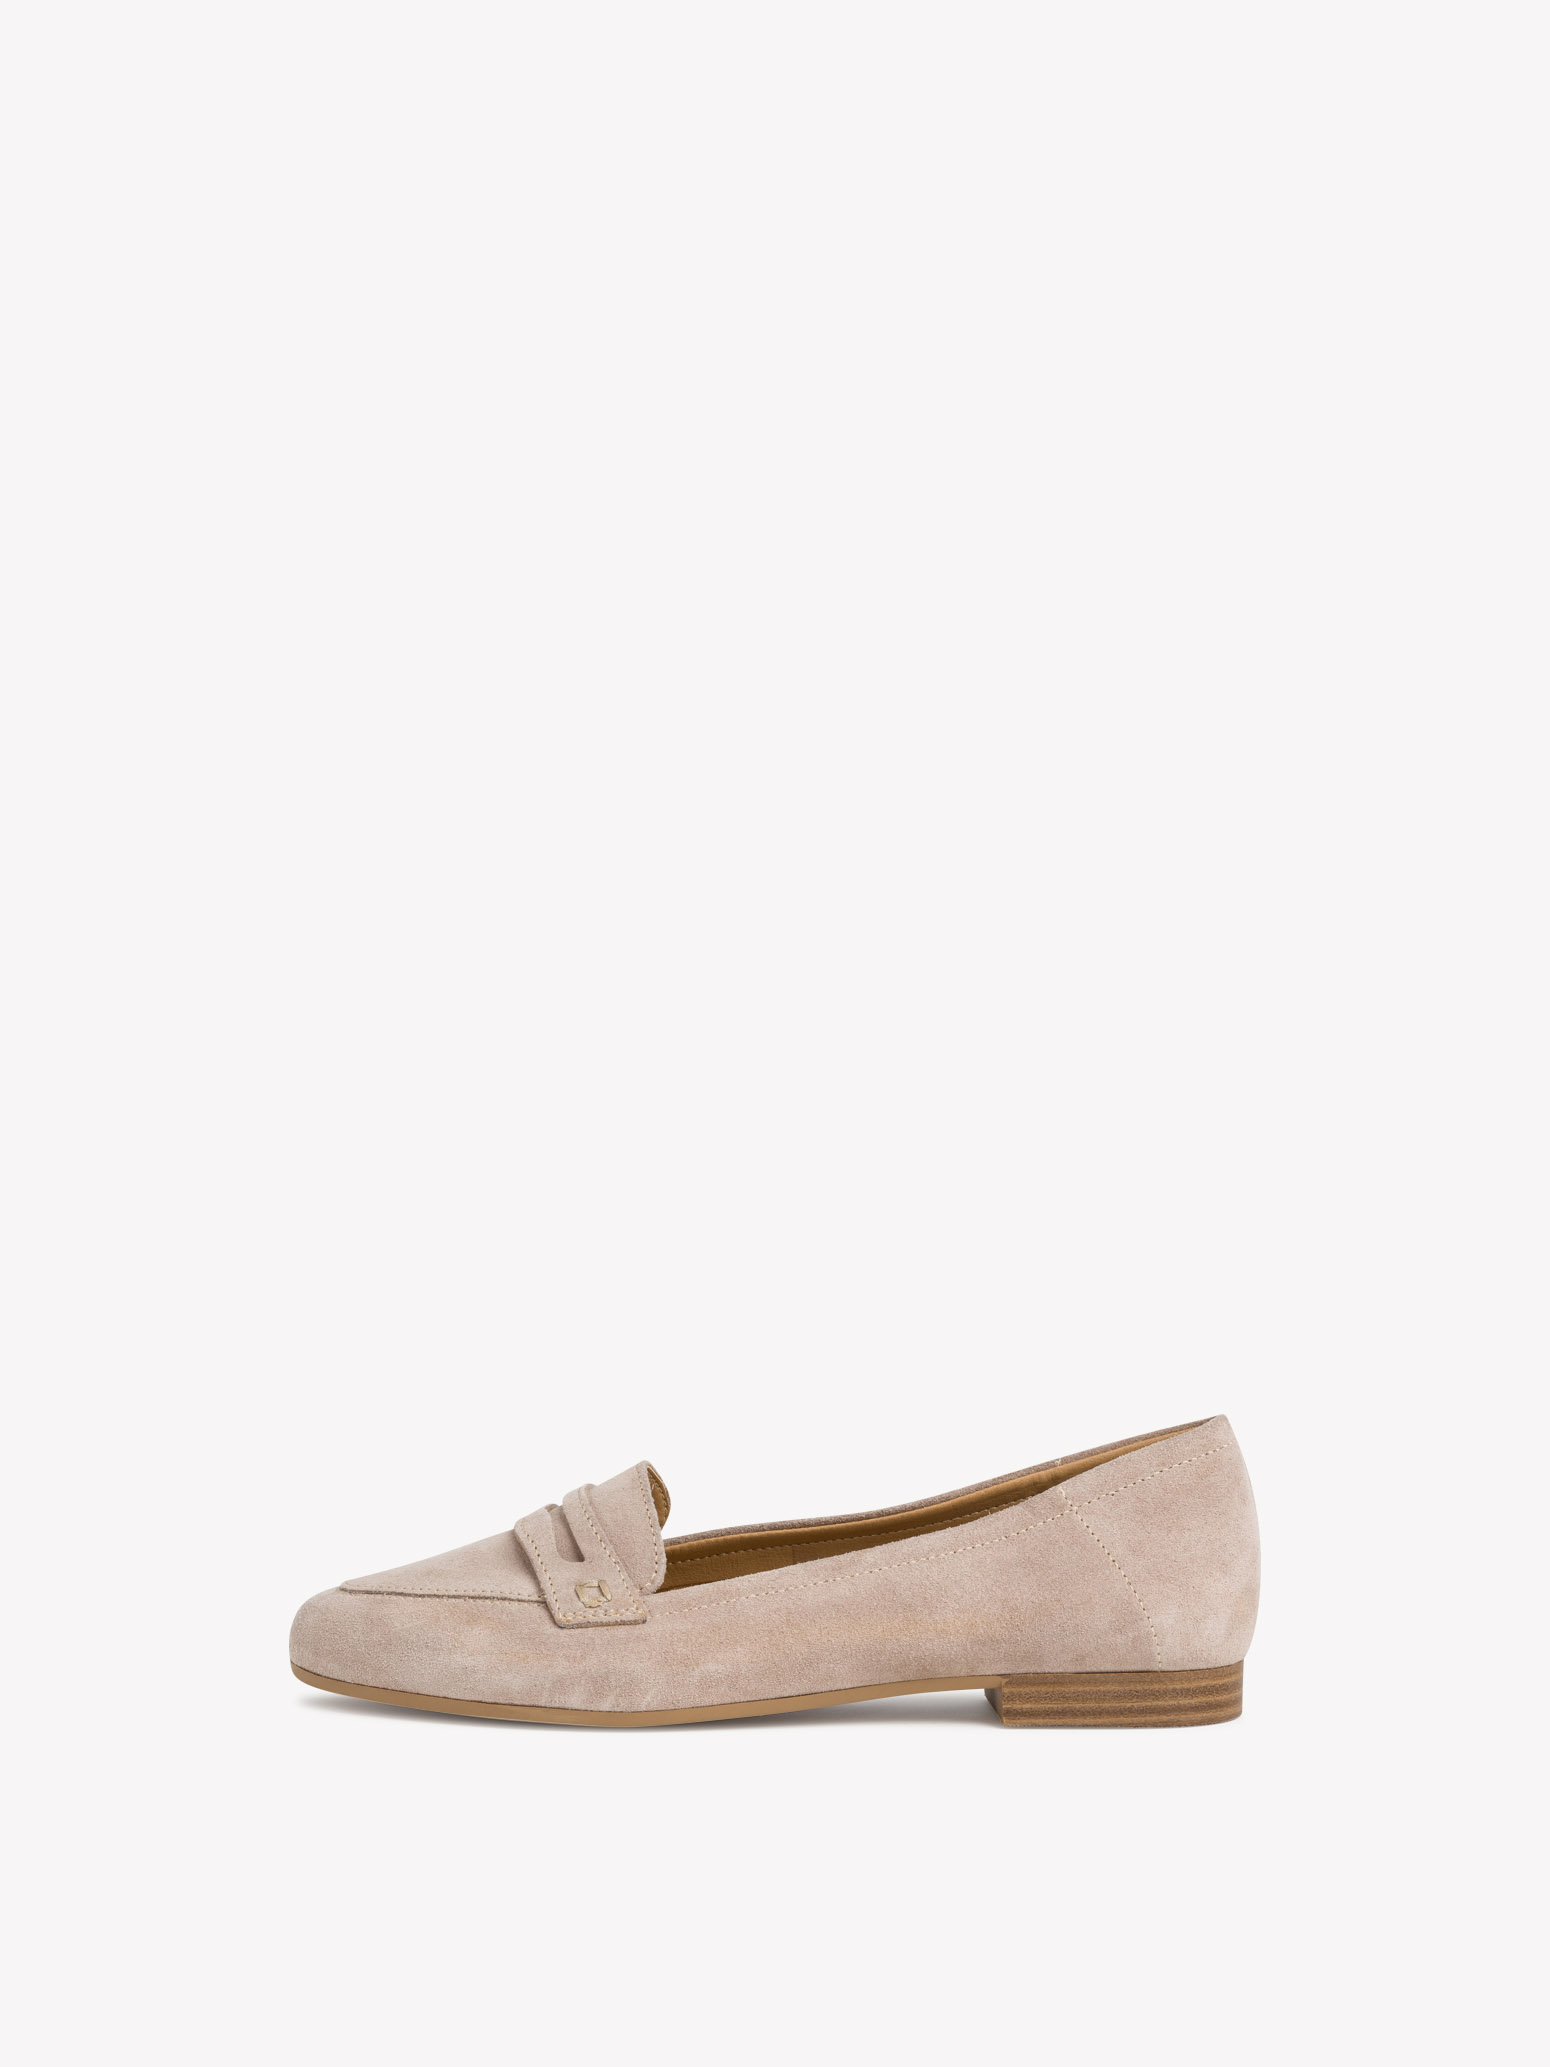 TAMARIS Schuhe Slipper beige Gr. 39